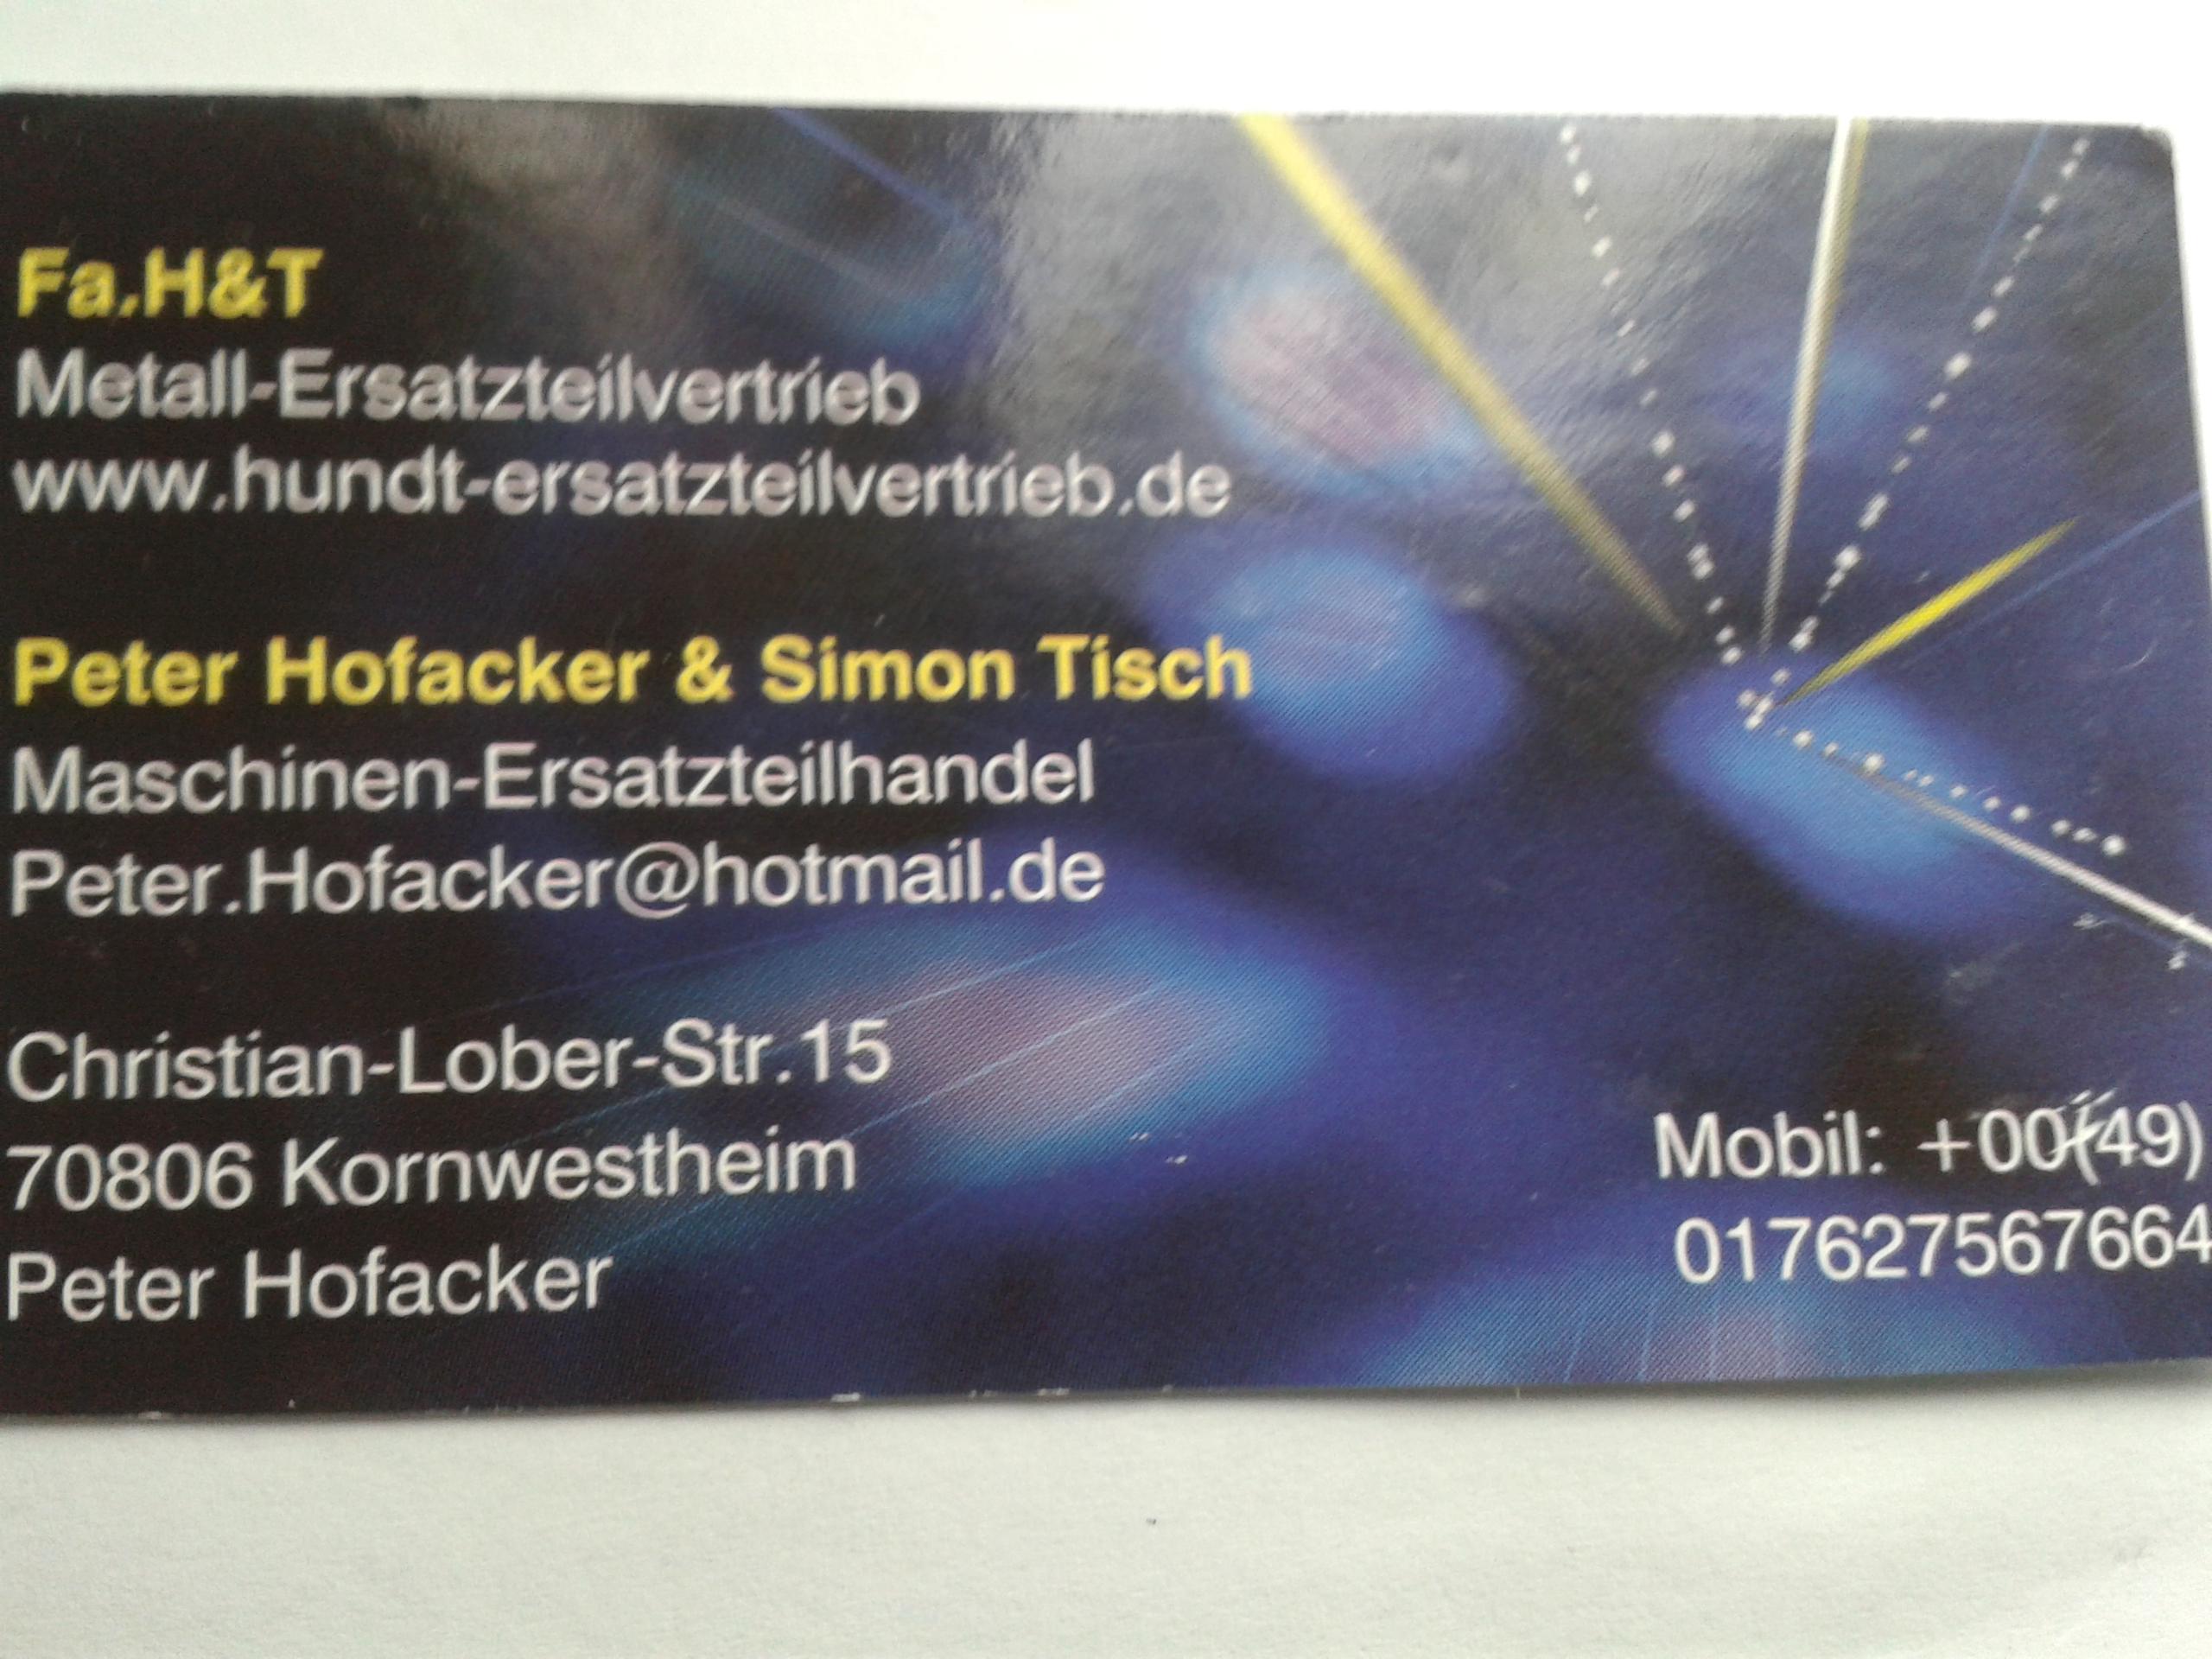 Hofacker&Tisch GBR